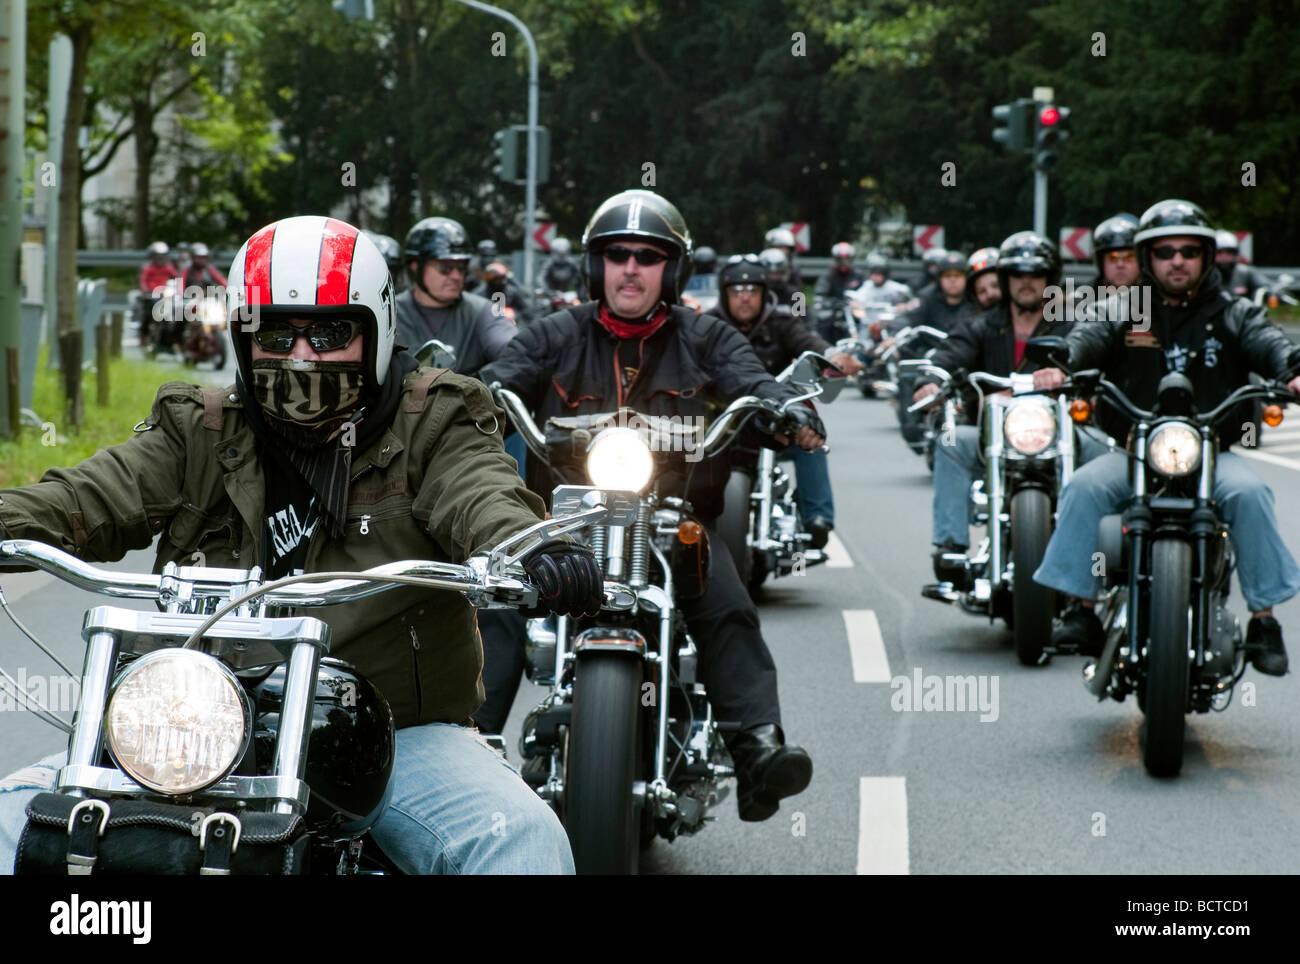 Motorrad-Parade, Crime City Run, Frankfurt am Main, Hessen, Deutschland, Europa Stockbild